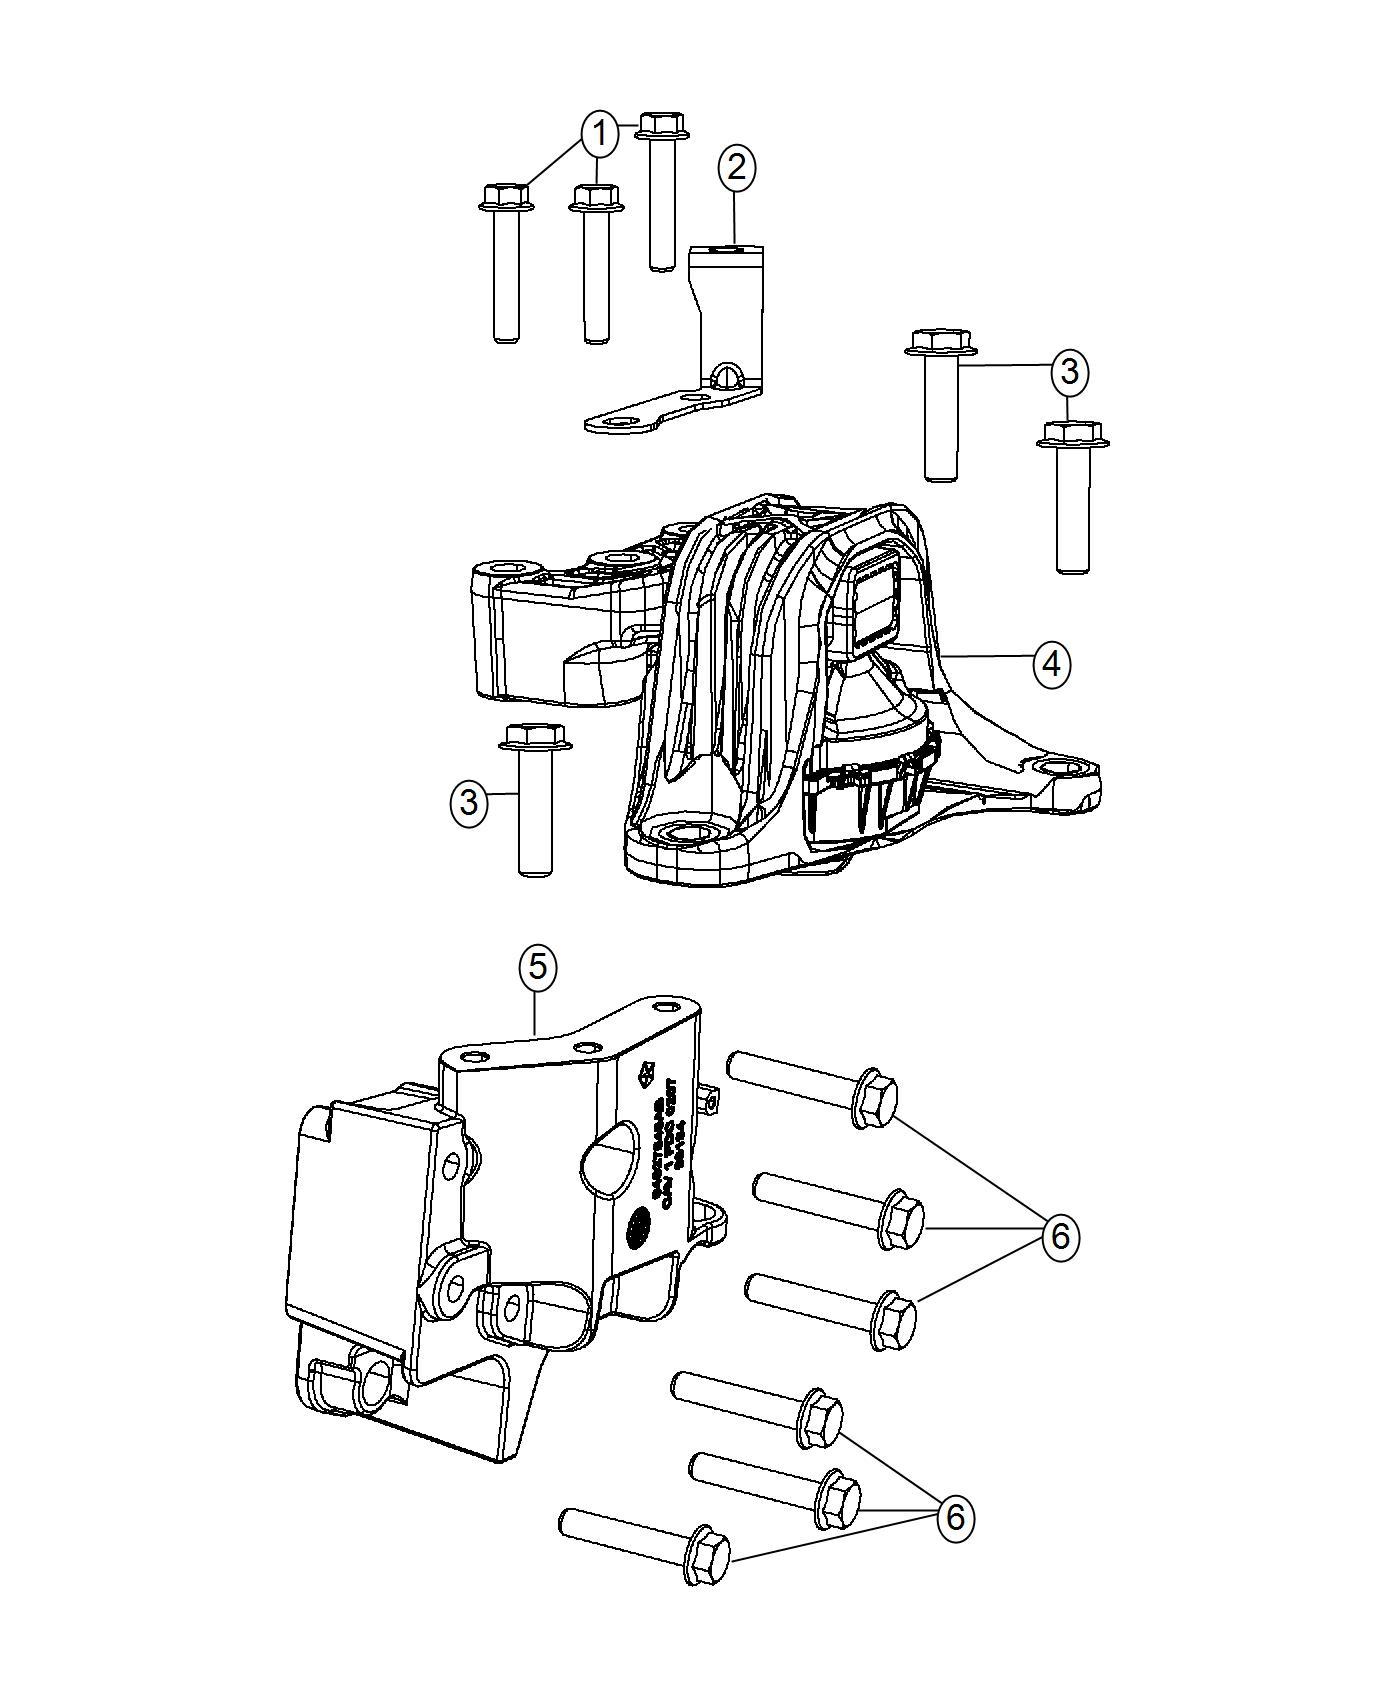 Fiat 500 Engine mount. Right. [5-spd c510 manual